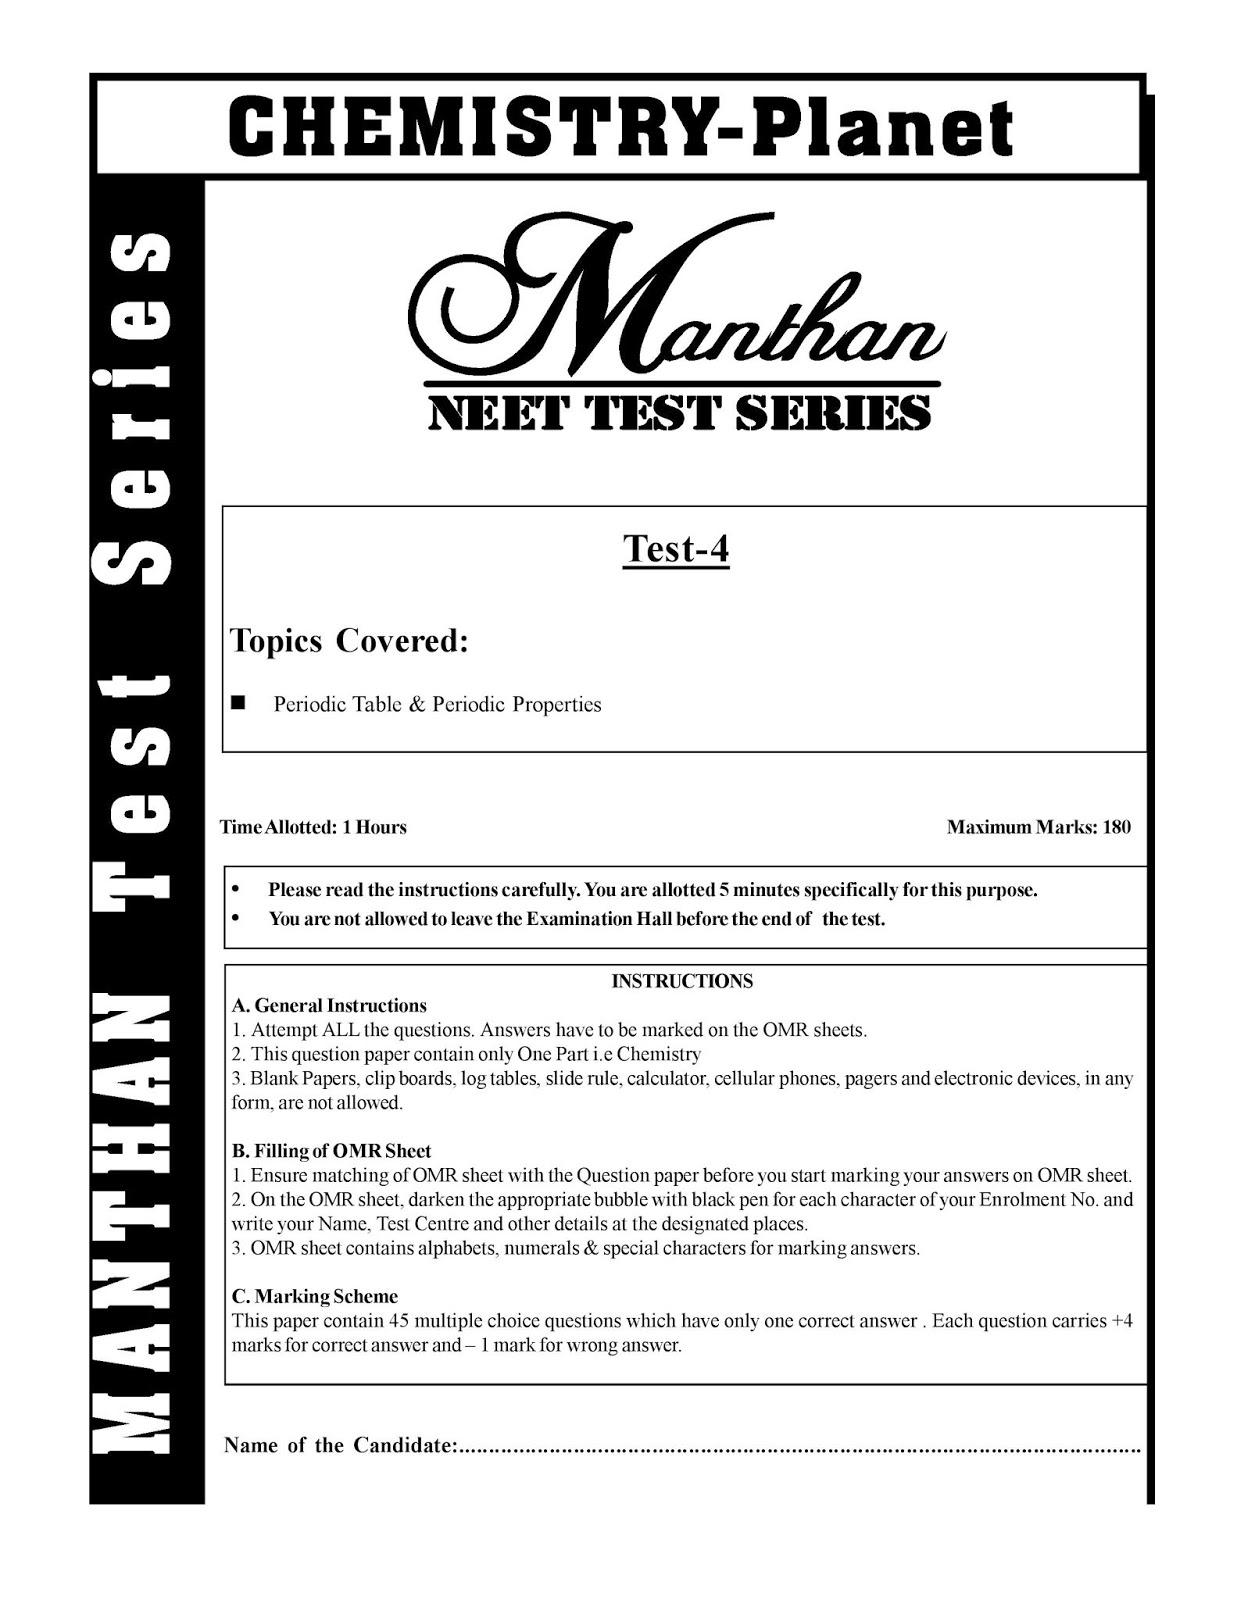 Free online chemistry study material for neetjee mainsjee adanced tapasya test series 1 2 jee advanced series urtaz Image collections